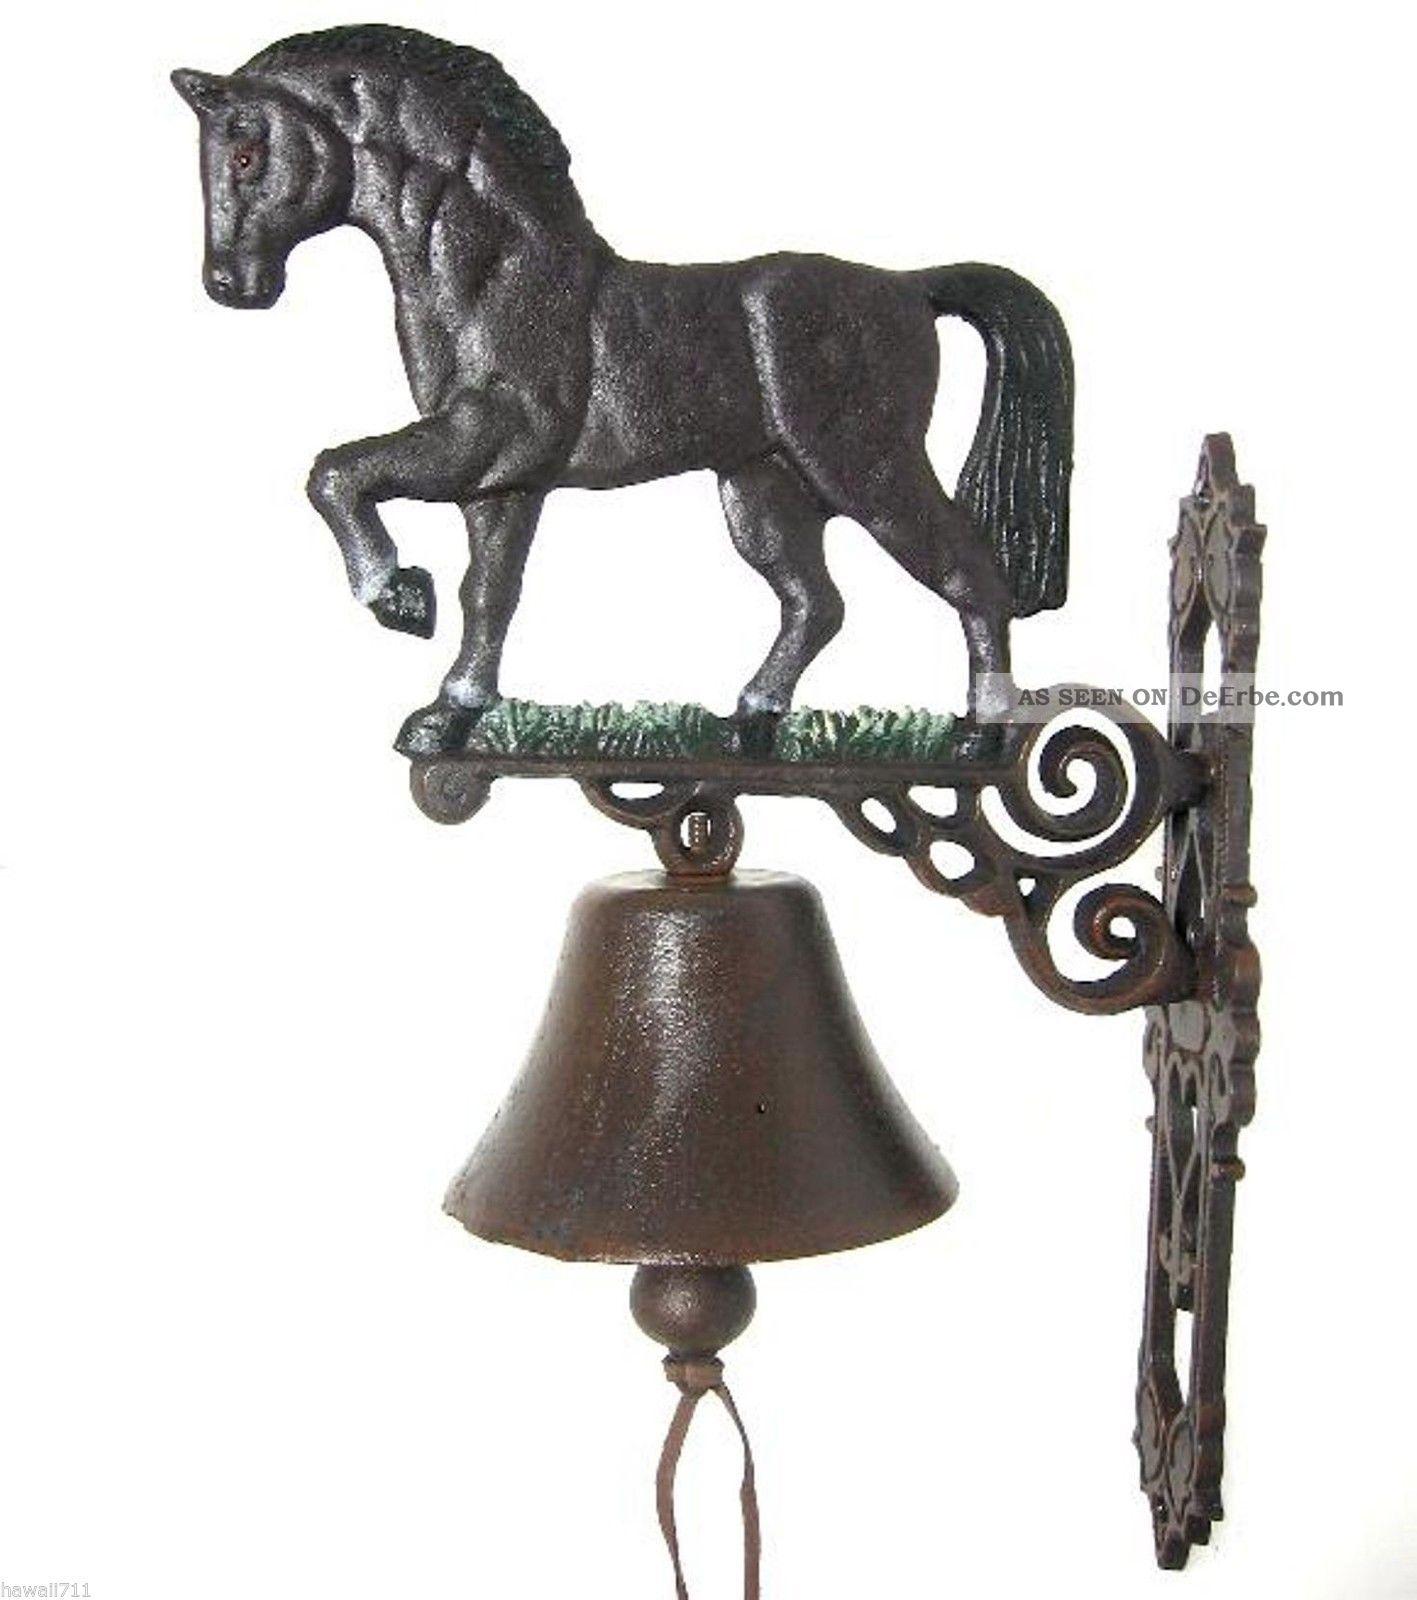 Türglocke Anik Wandglocke Glocke Gusseisen Gartenglocke Pferd Türklingel 45 Cm Nostalgie- & Neuware Bild